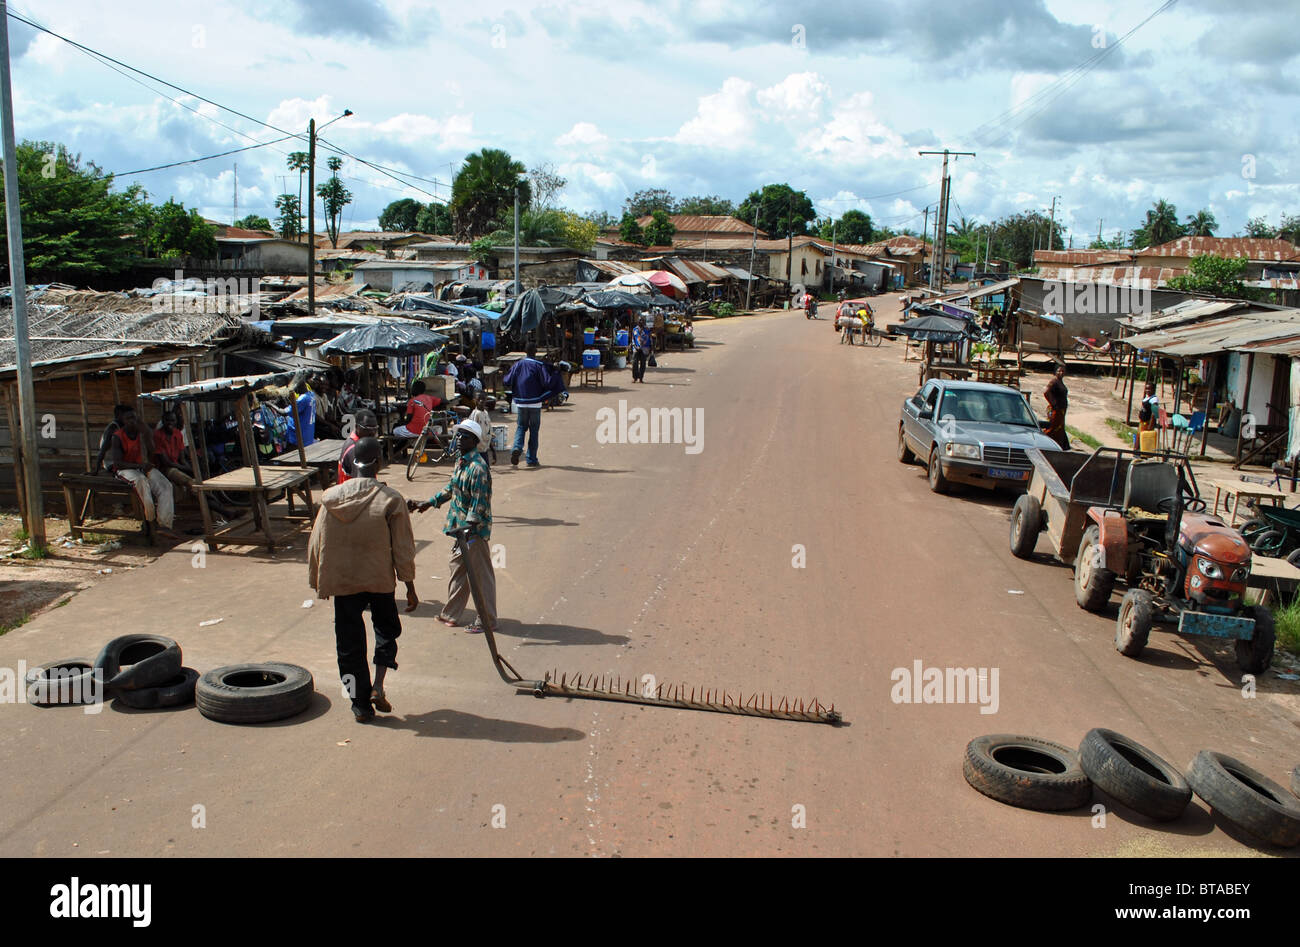 Roadblock in Guiglo, western Ivory Coast, West Africa. - Stock Image